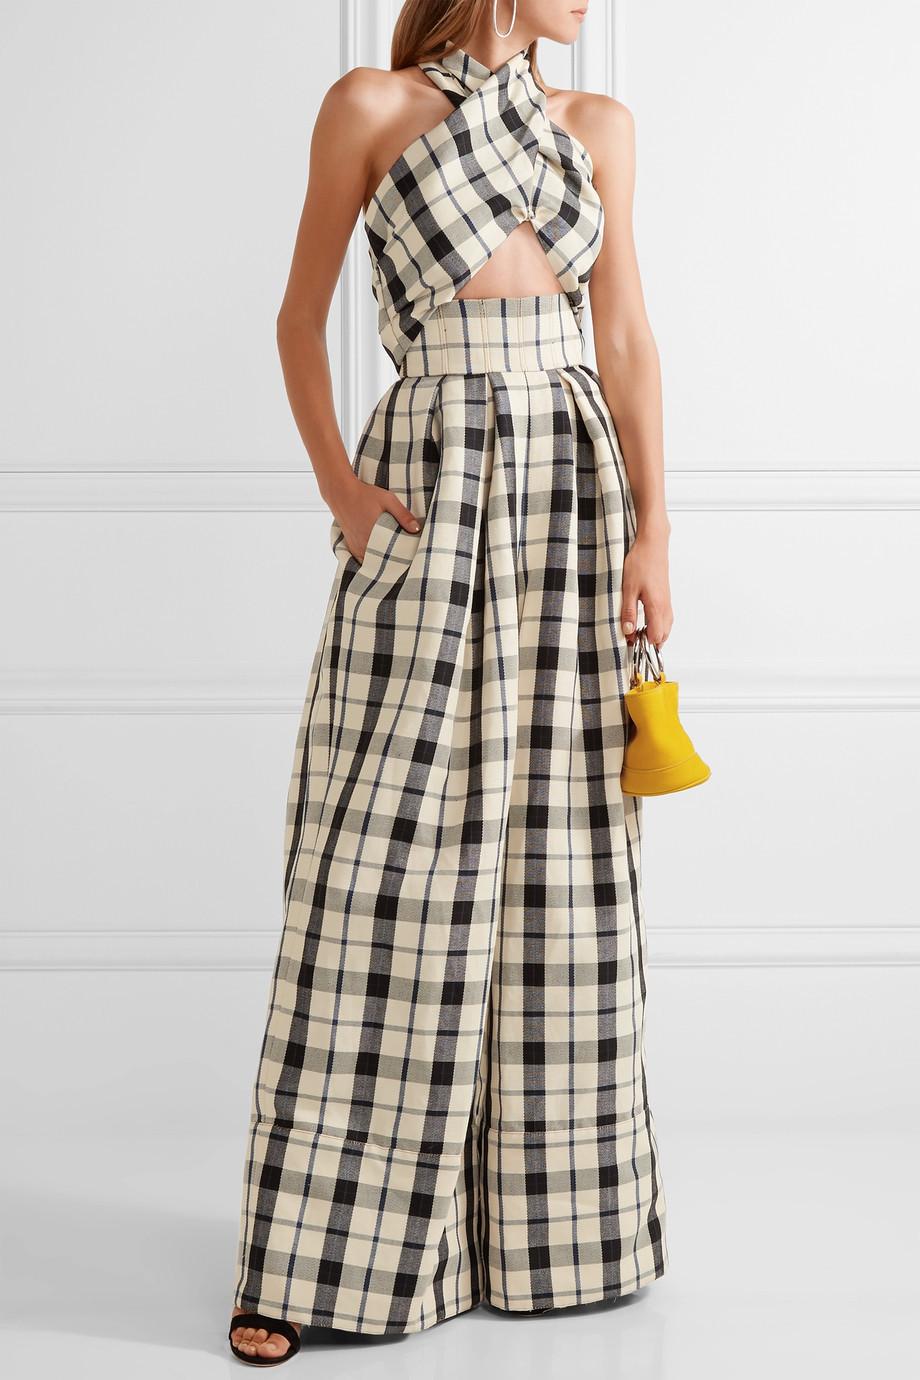 Rosie Assoulin Artichoke Hearts cutout checked cotton and linen-blend jumpsuit $2,295